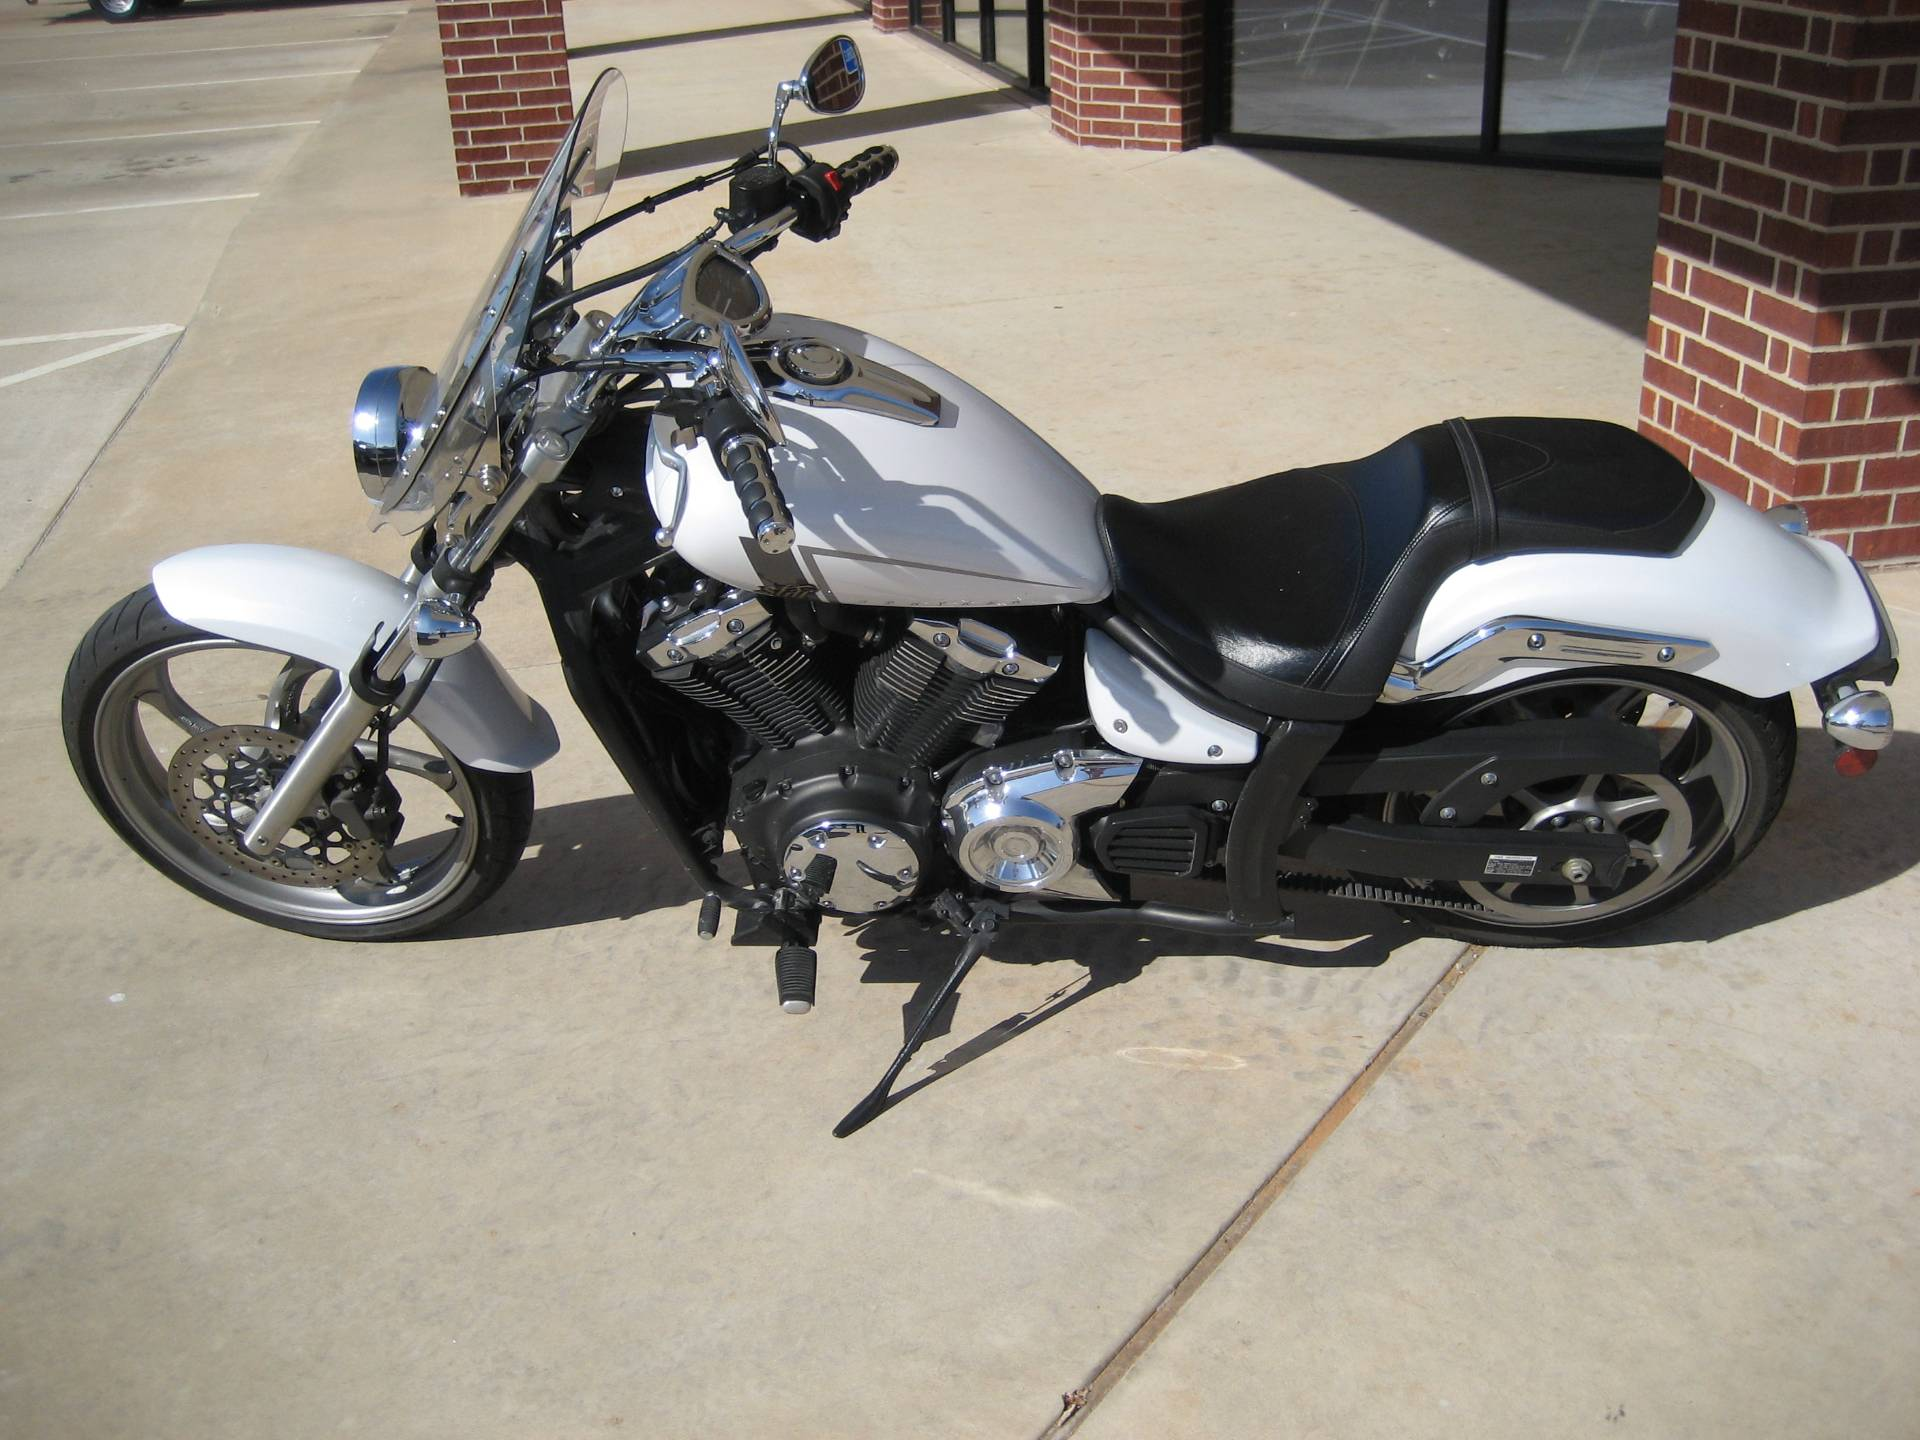 2013 Yamaha Stryker for sale 135477